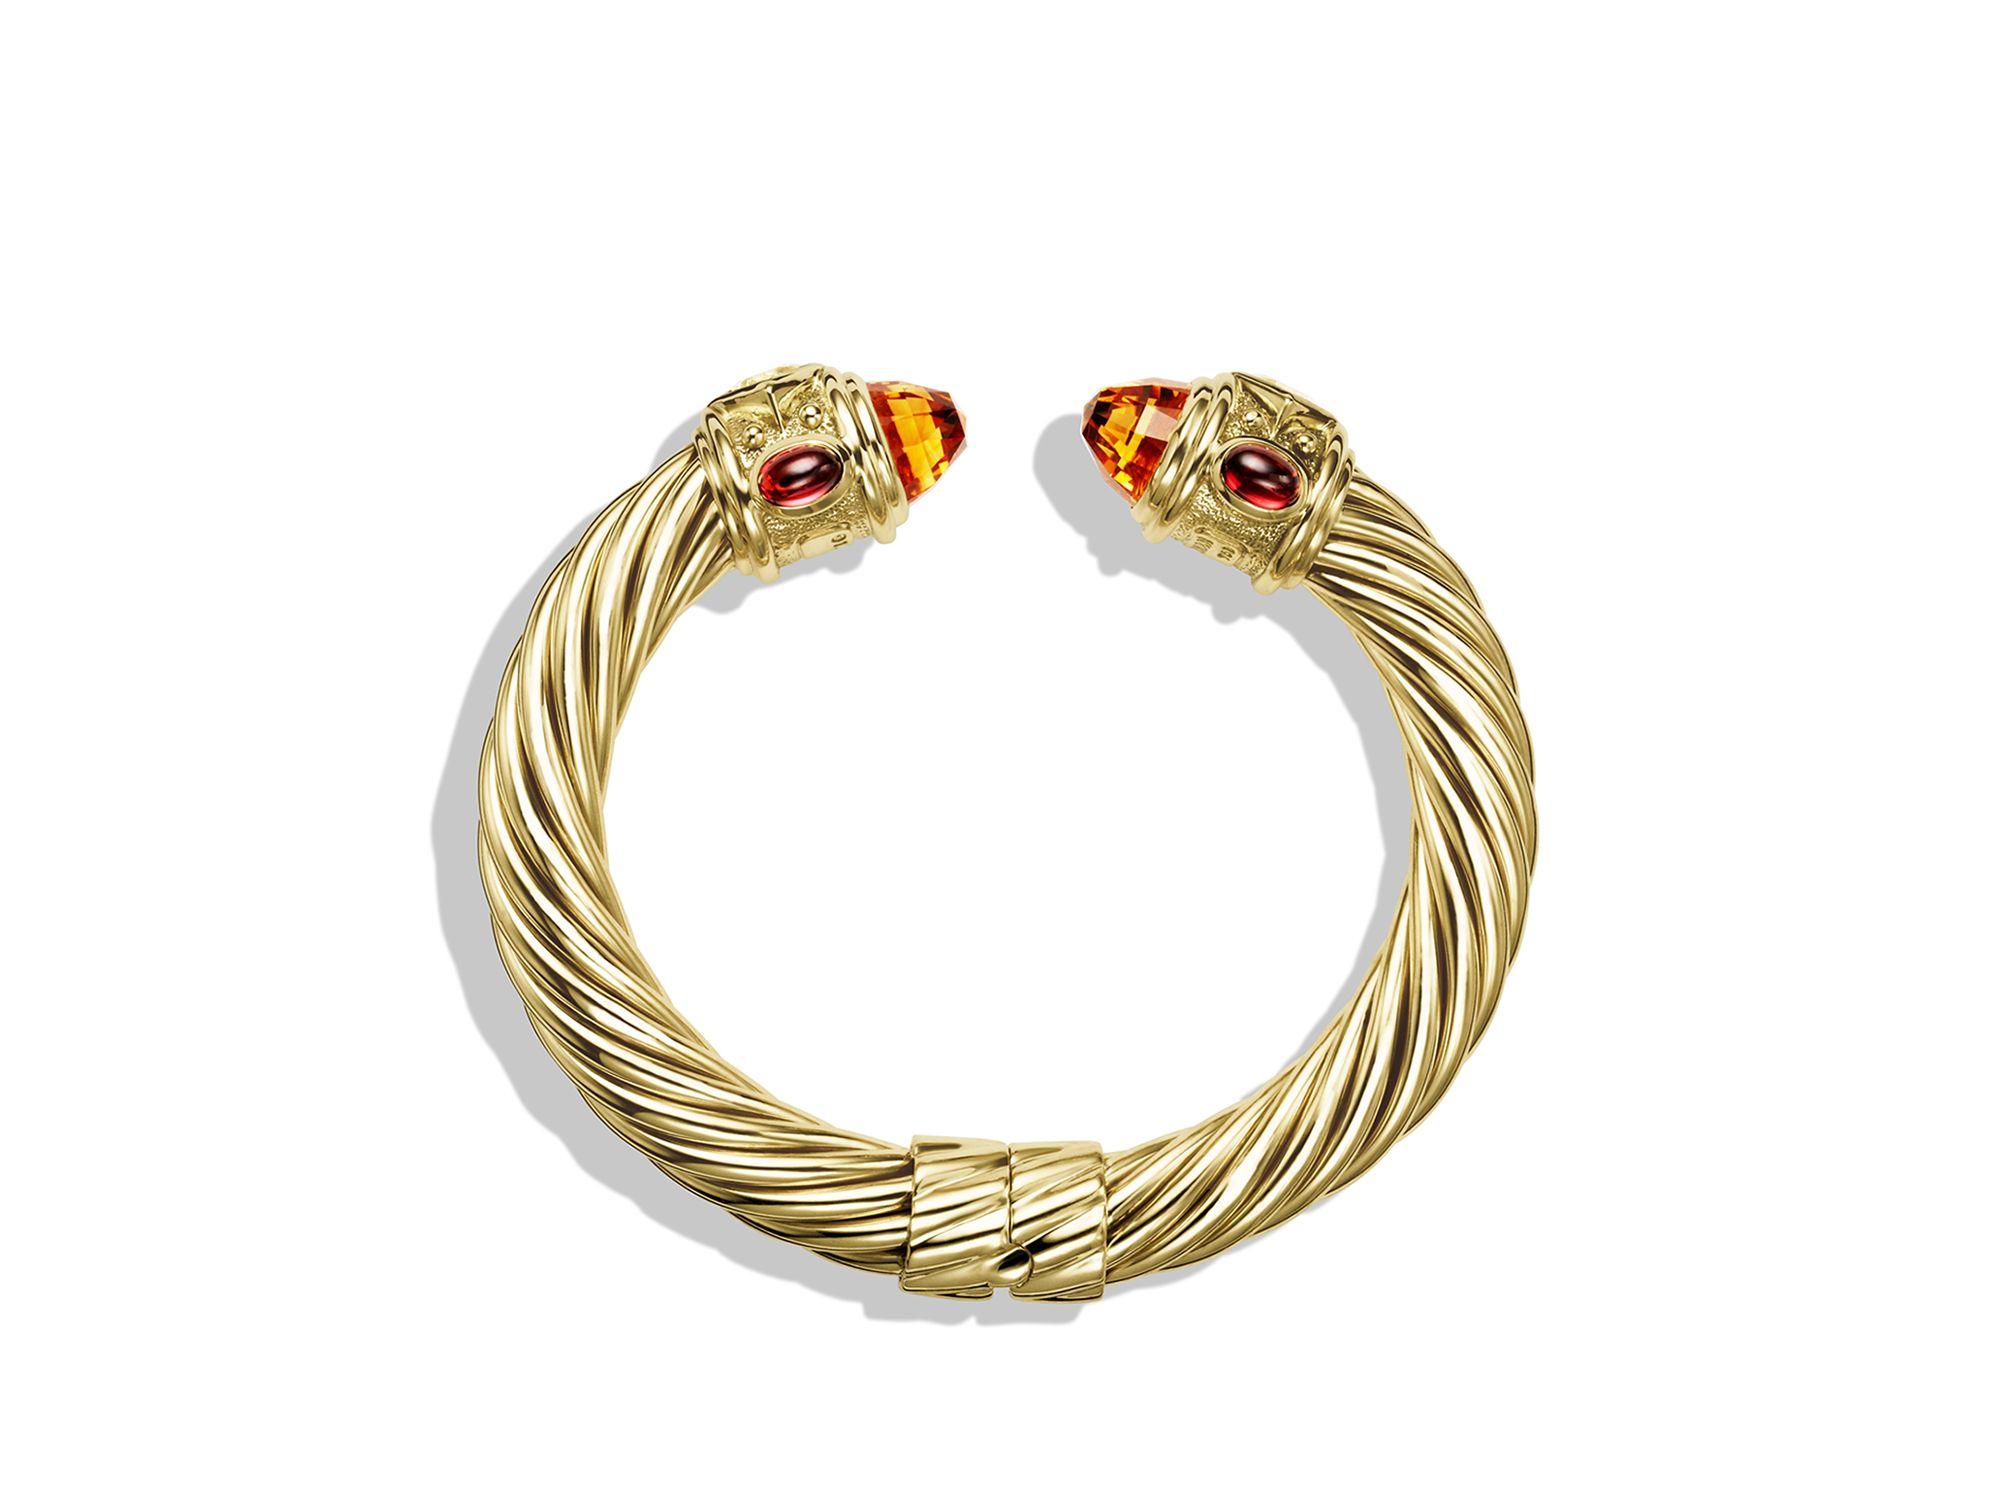 David Yurman Renaissance Bracelet With Citrine And Iolite